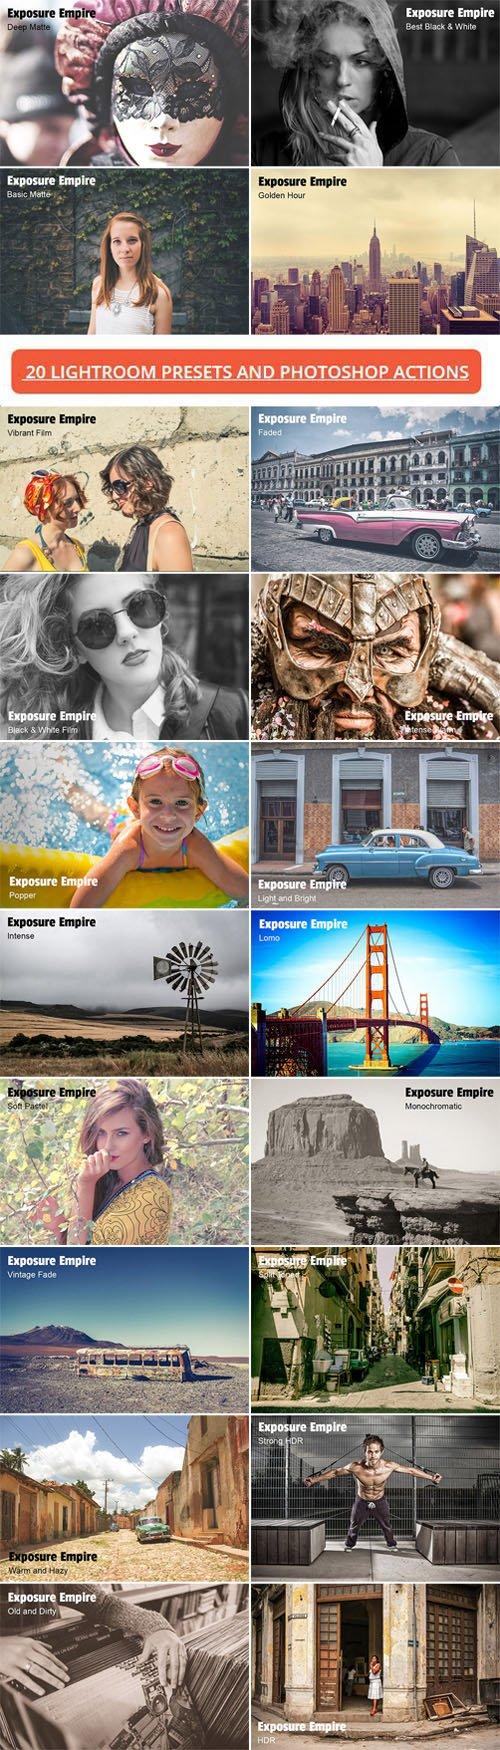 20 Photoshop Actions & Lightroom Presets